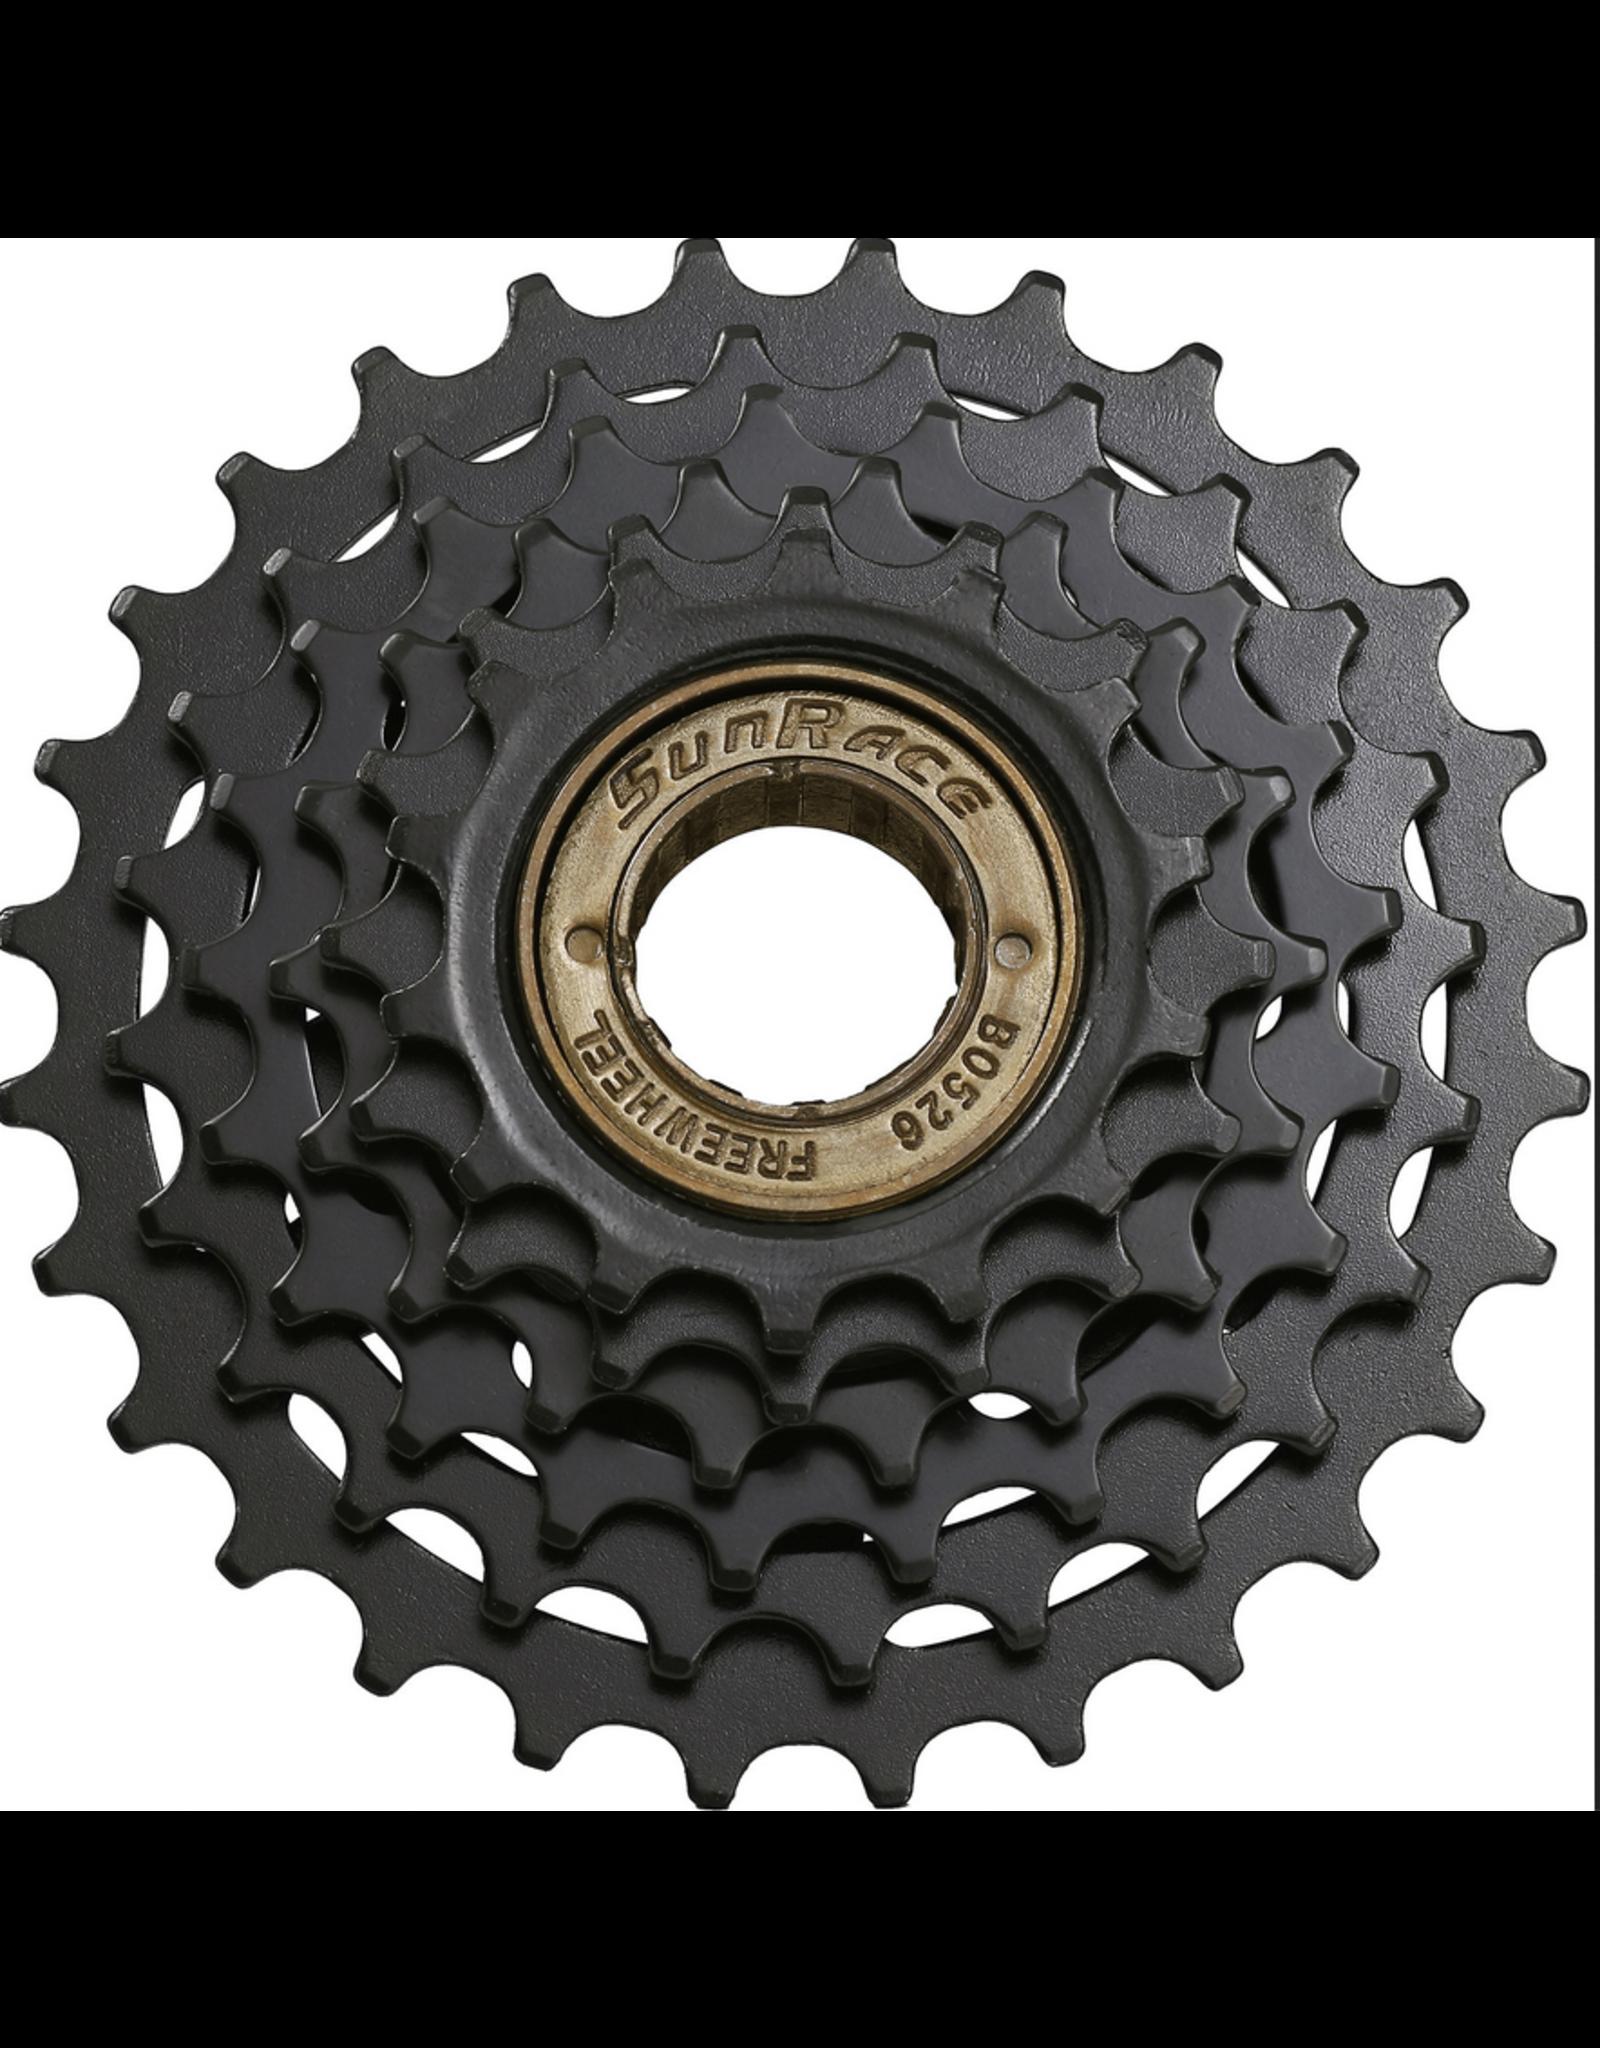 GENERIC Assorted Freewheel 14-28 6 Speed